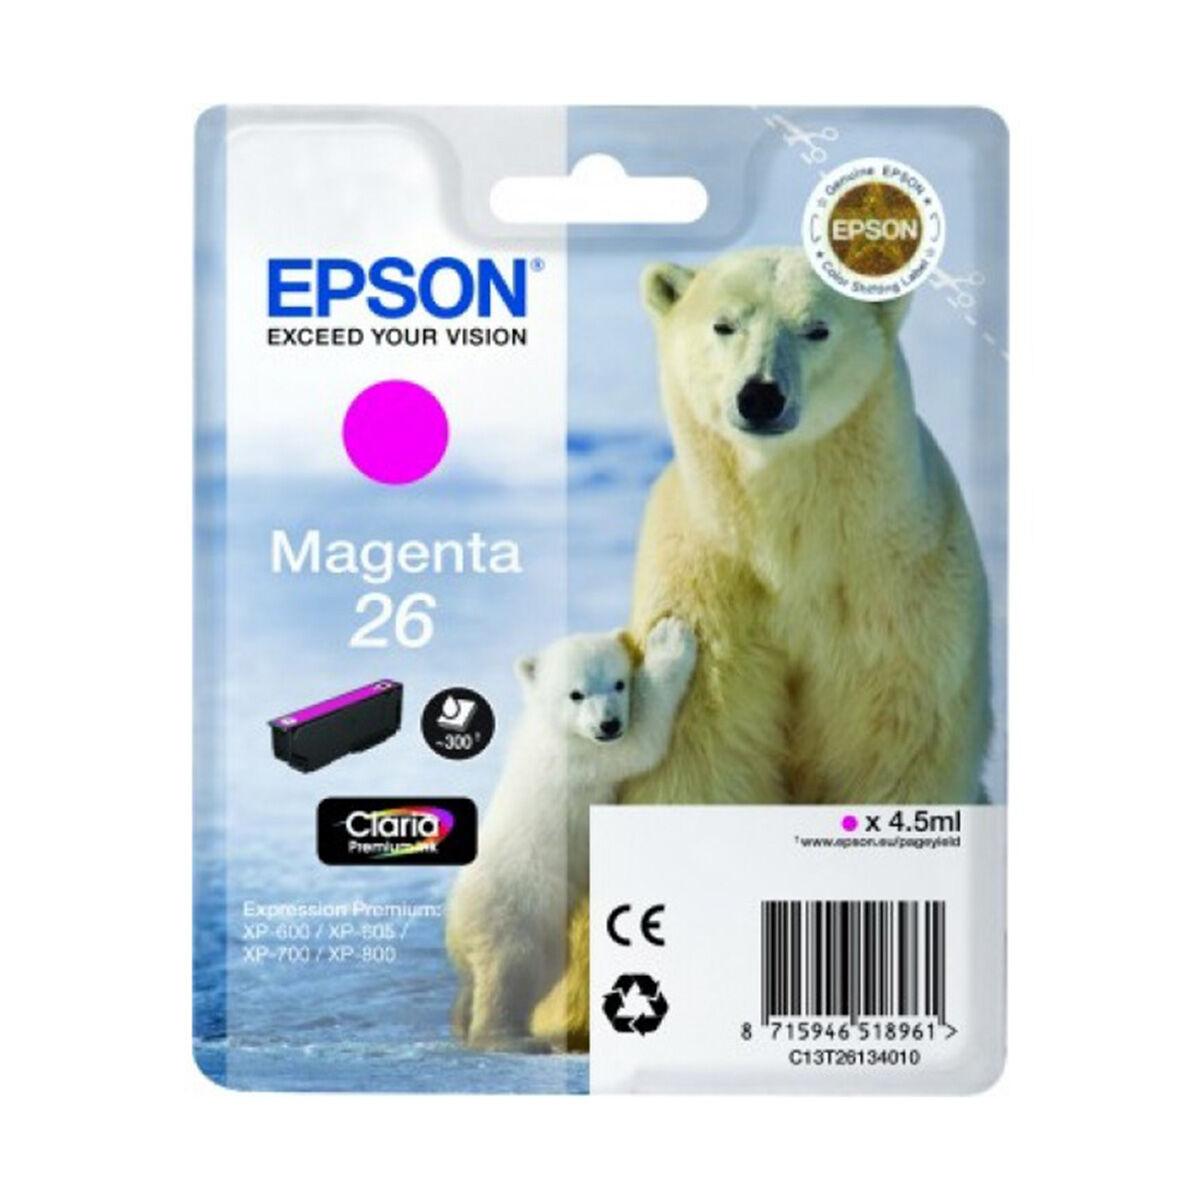 Cartouche Imprimante Epson «ours Polaire» - N°26 Magenta